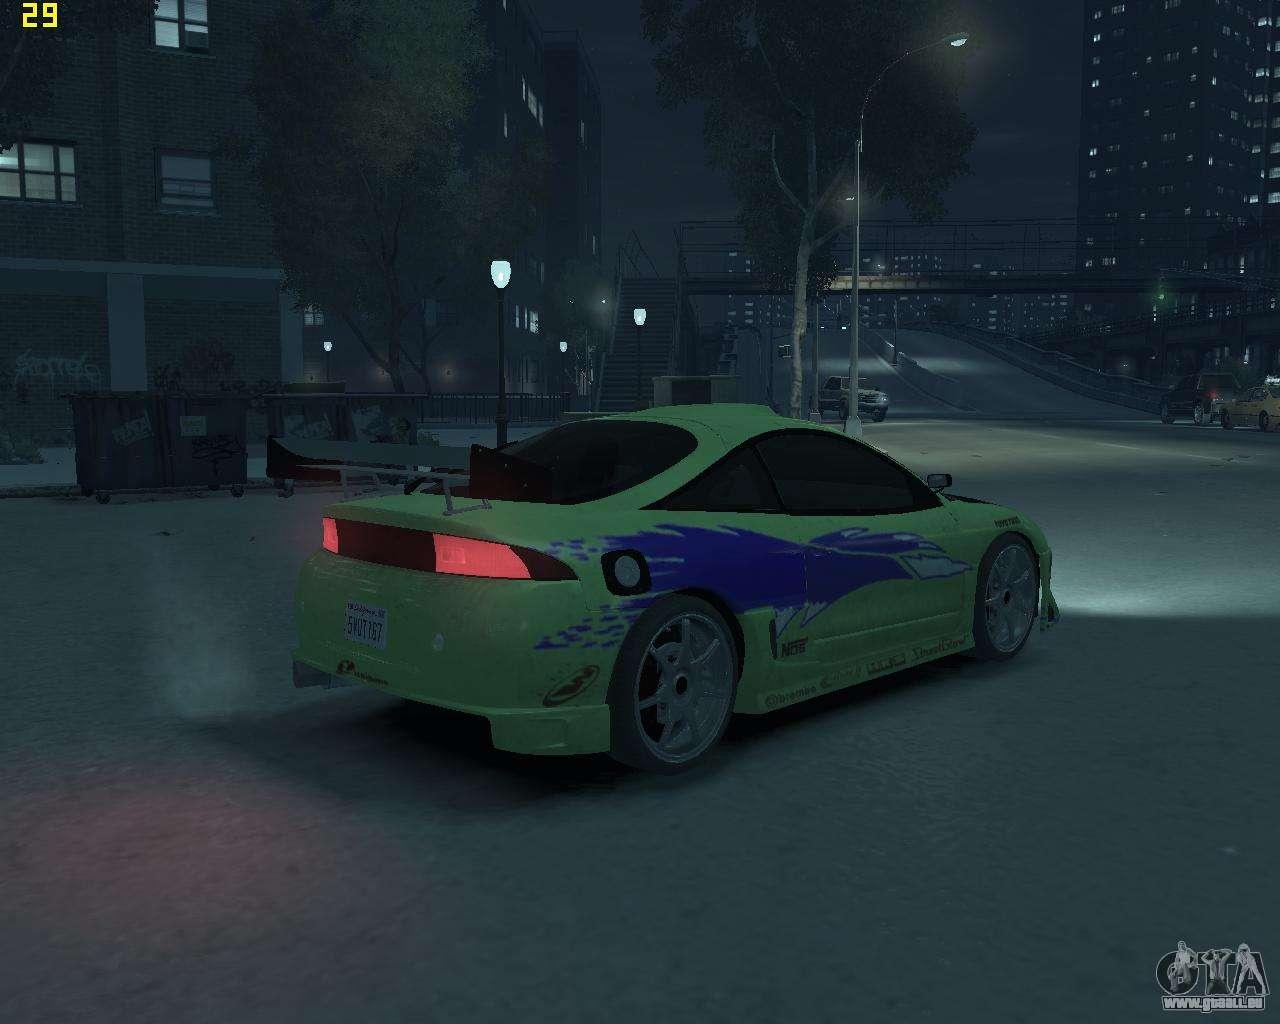 2014 Mitsubishi Eclipse >> Mitsubishi Eclipse from Fast and Furious pour GTA 4